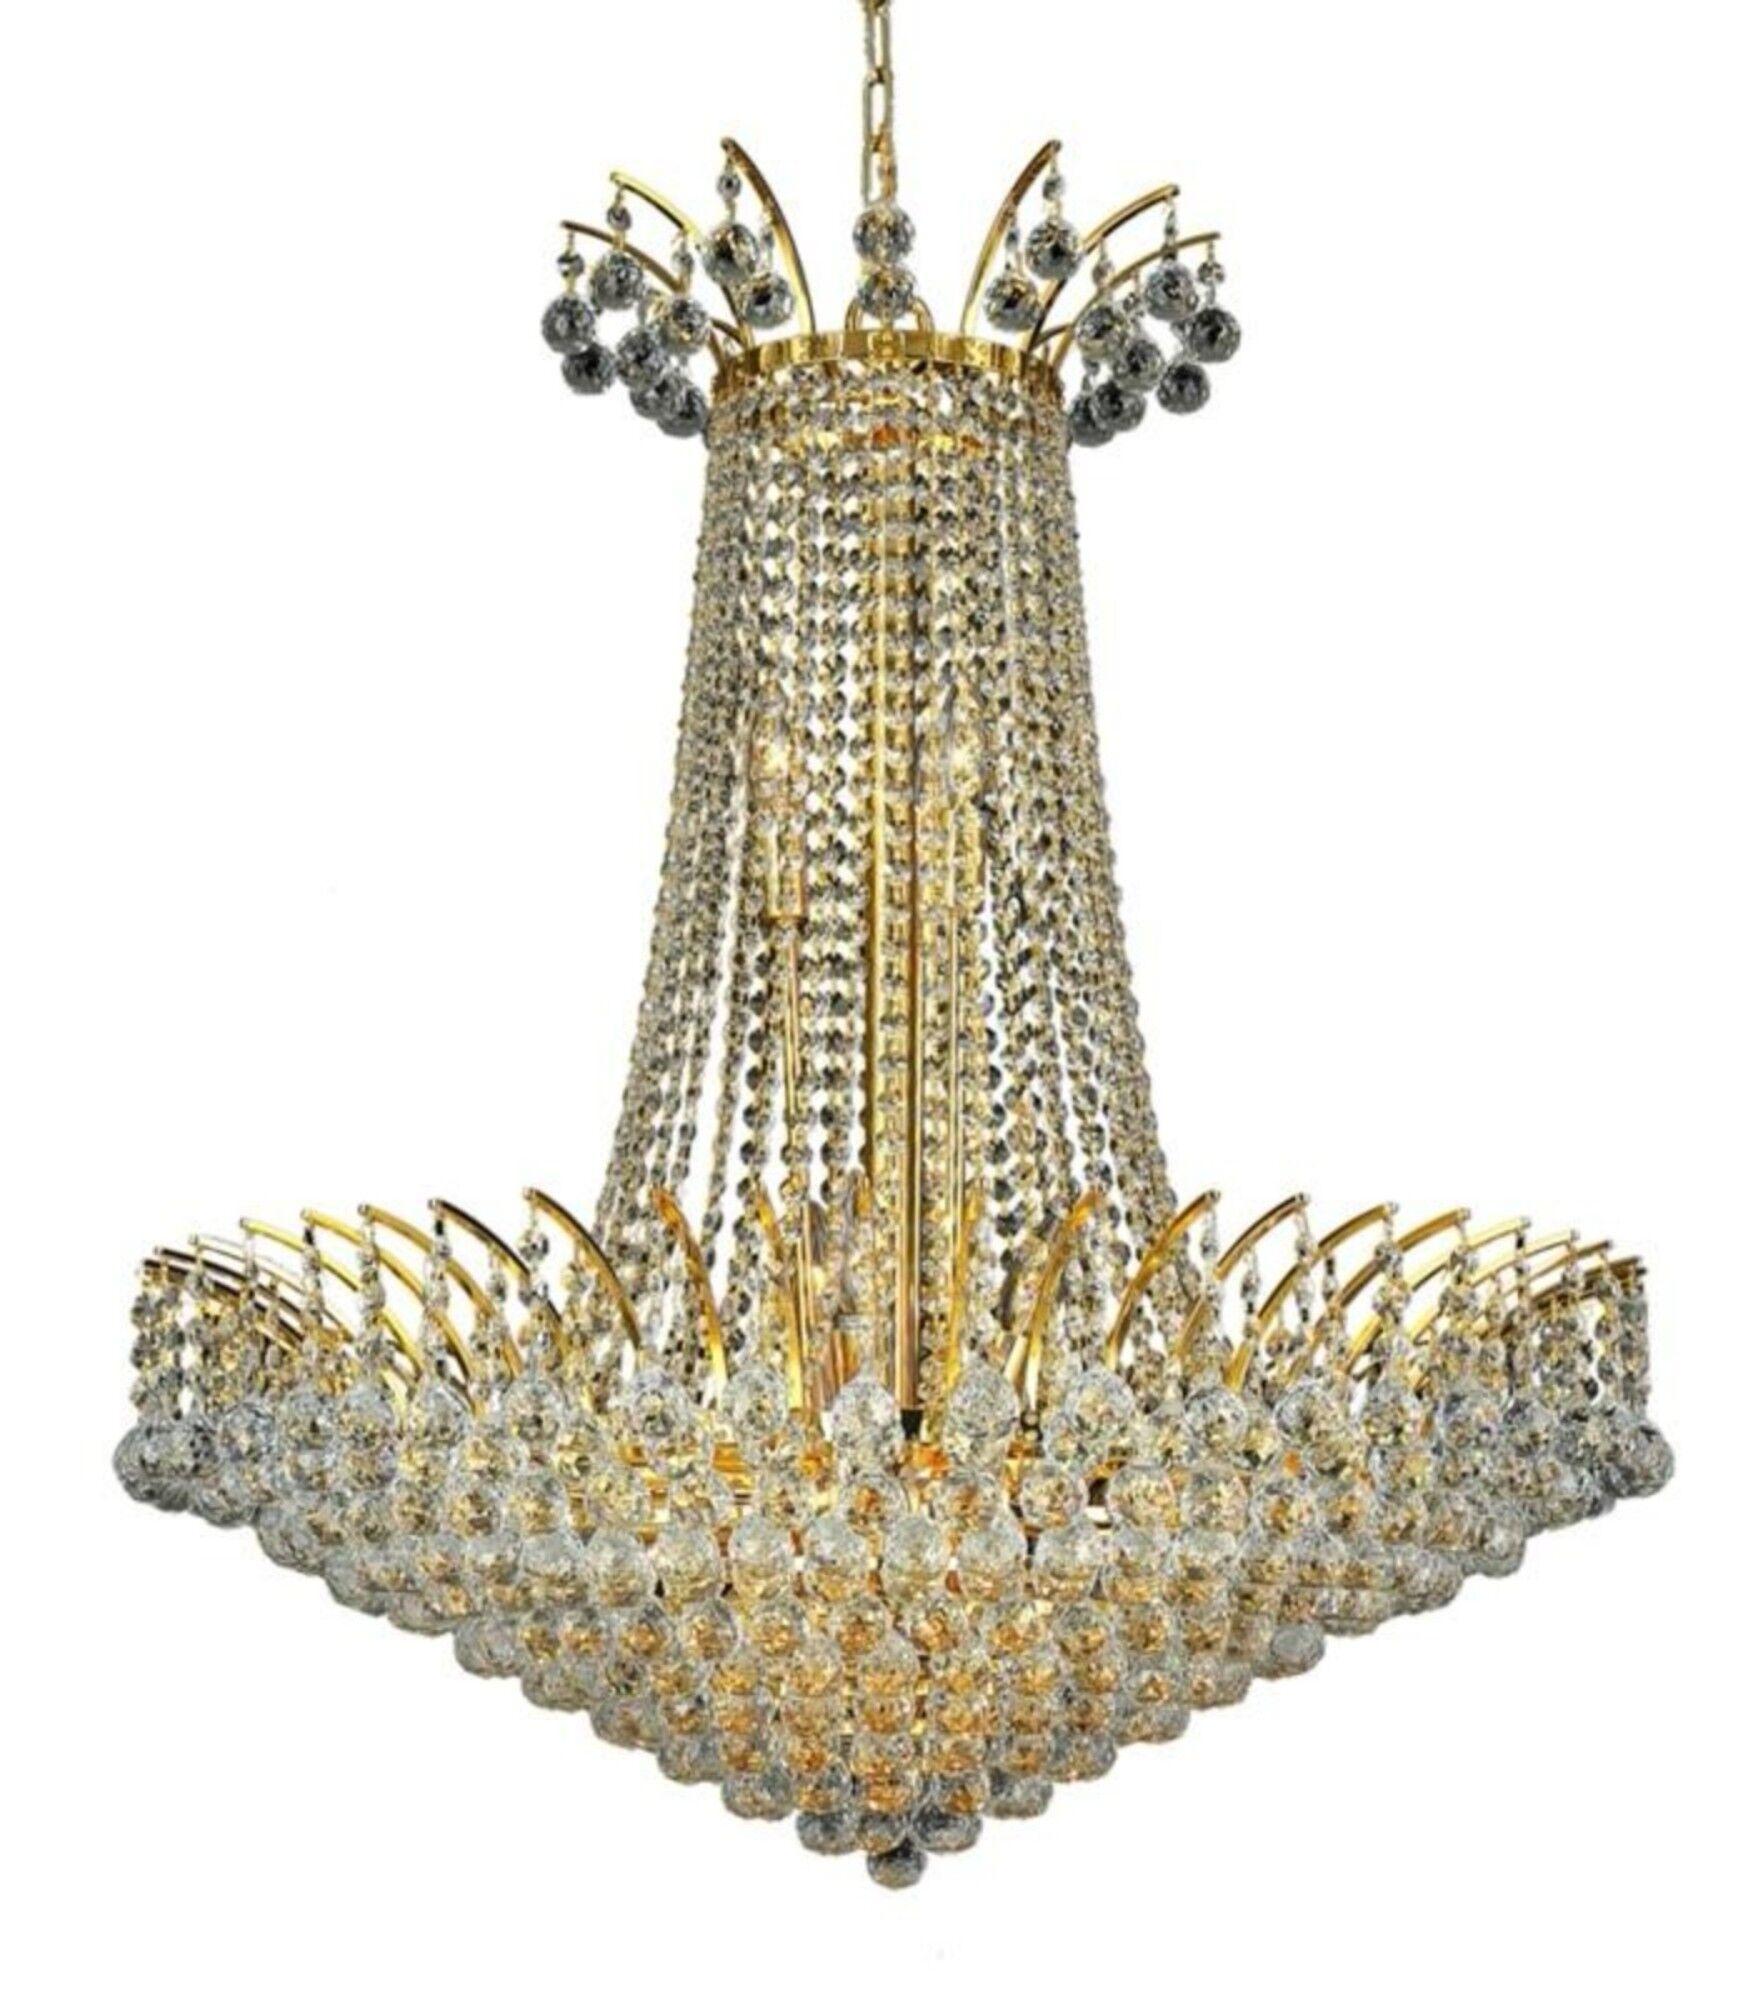 Phyllida 16-Light Empire Chandelier Finish: Gold, Crystal: Strass Swarovski